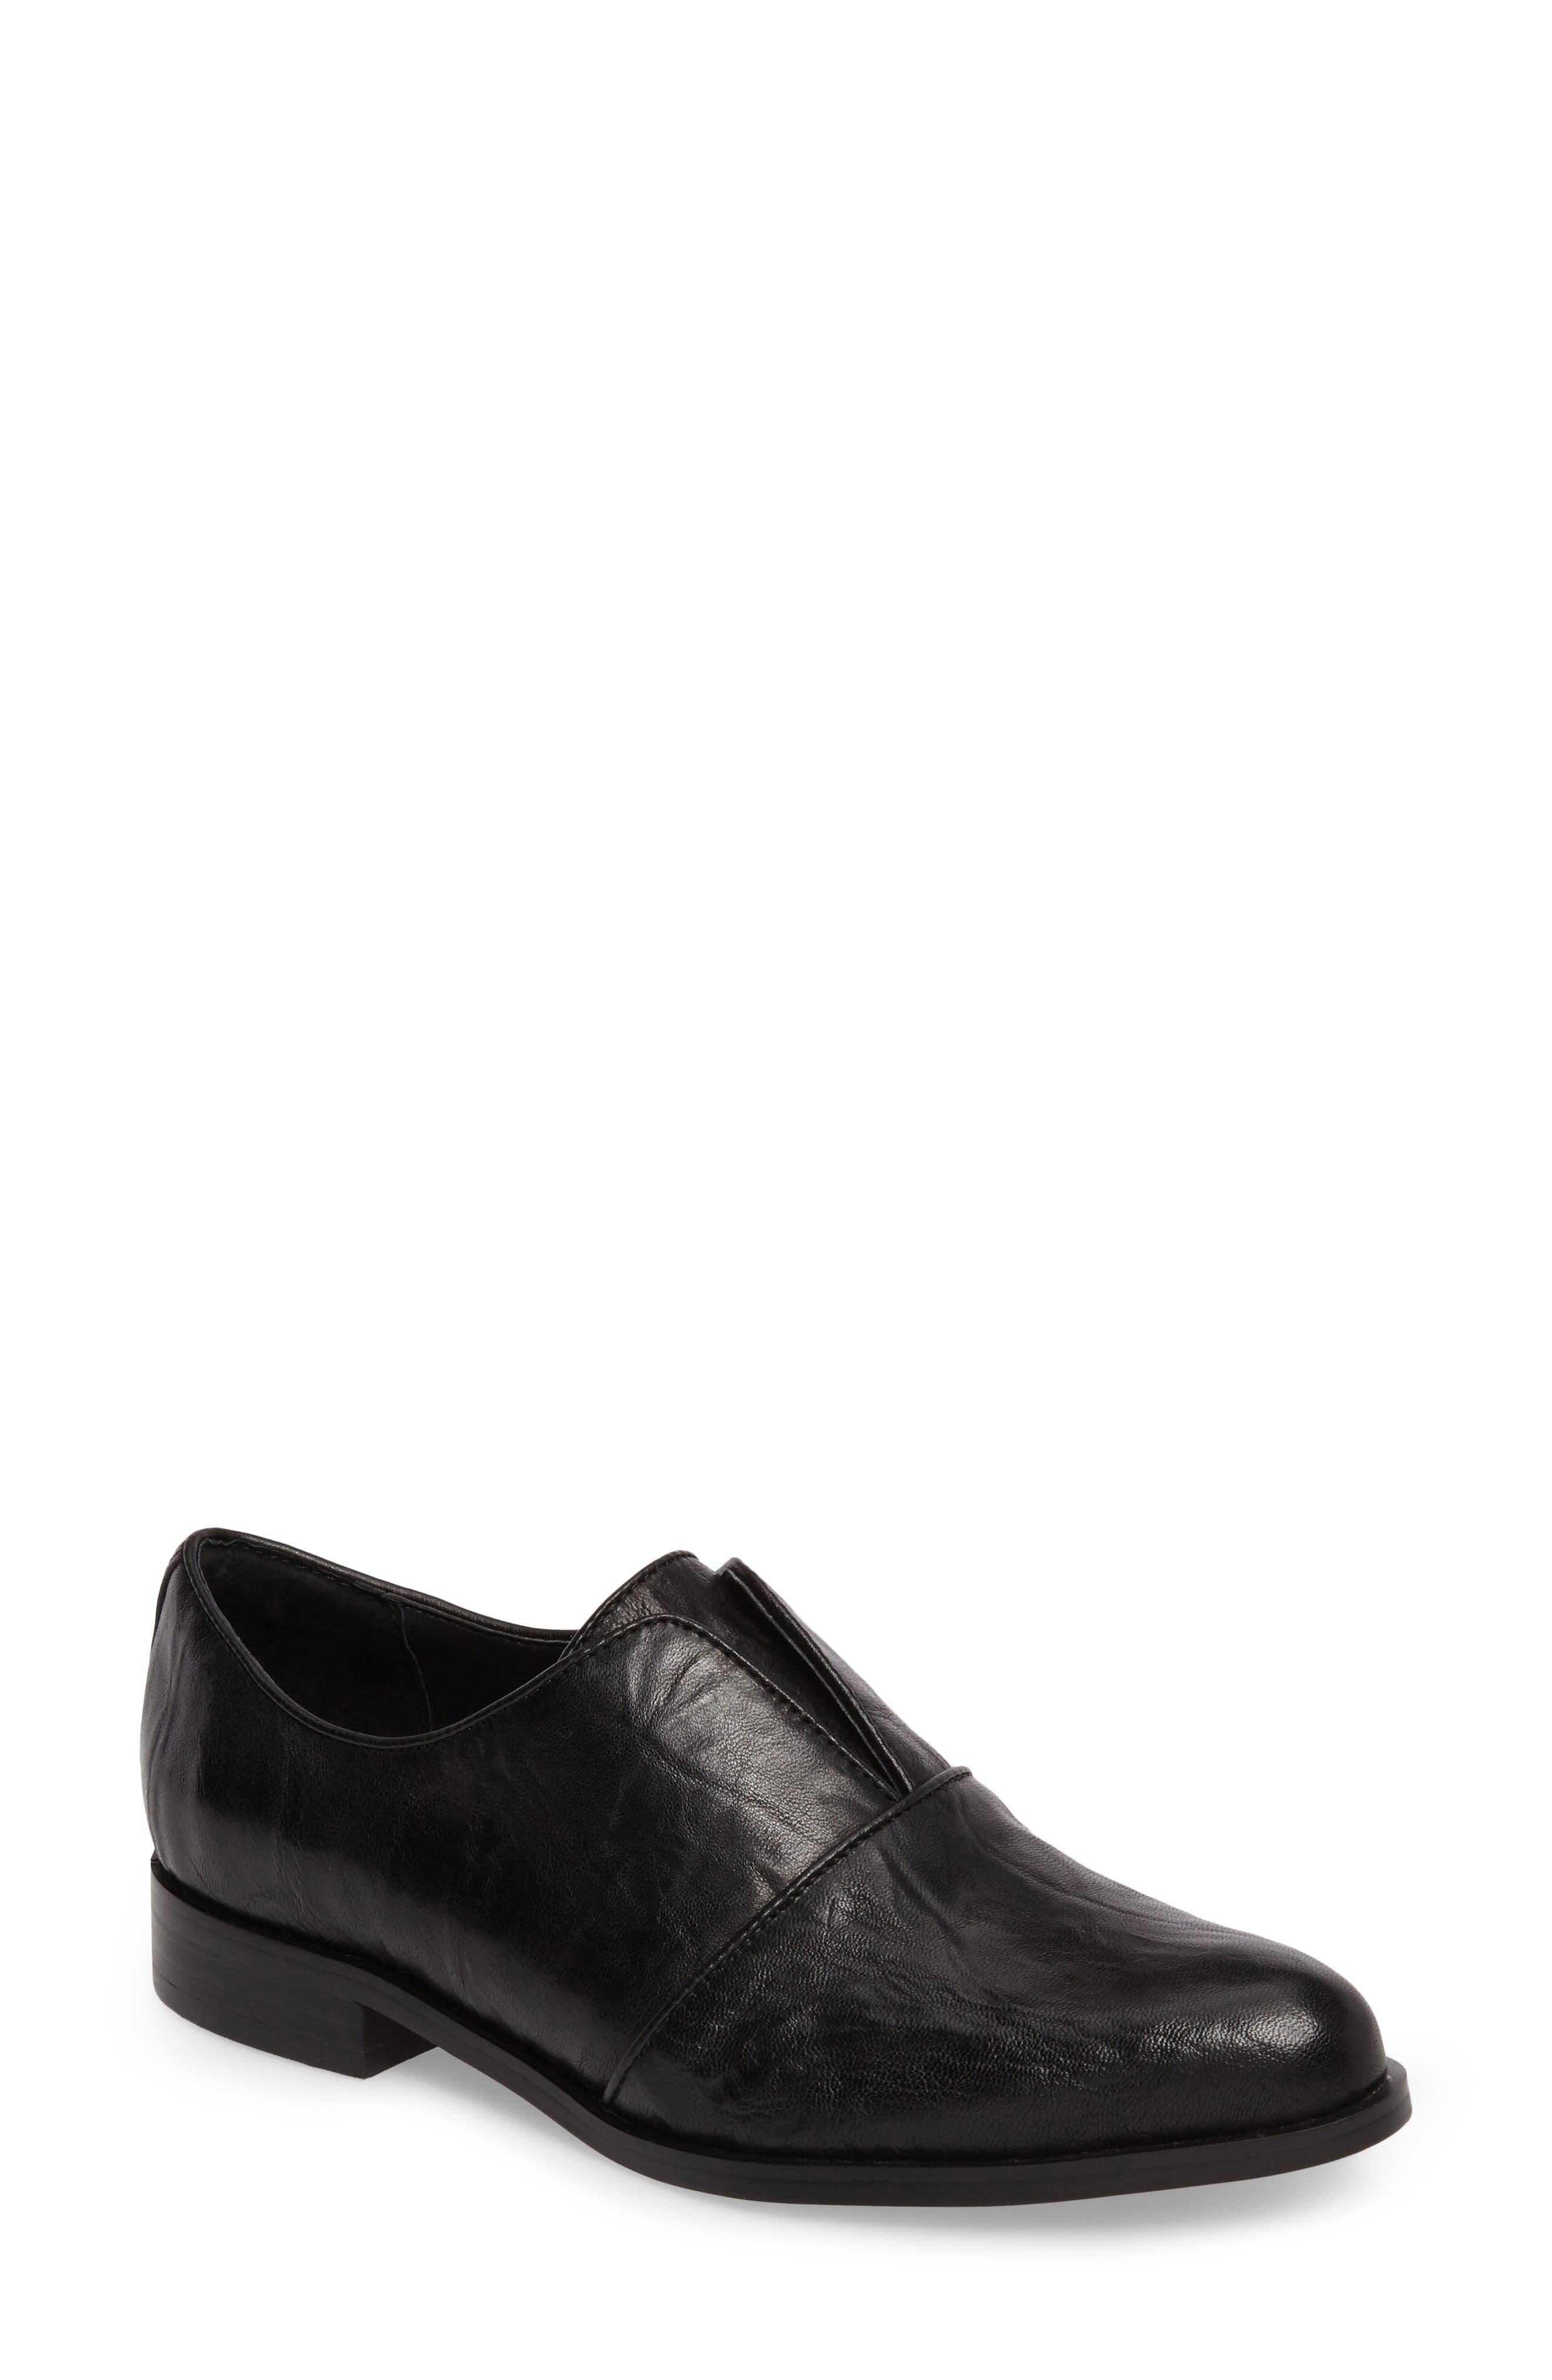 Isola Maria Slip-On Oxford,                             Main thumbnail 1, color,                             Black Leather